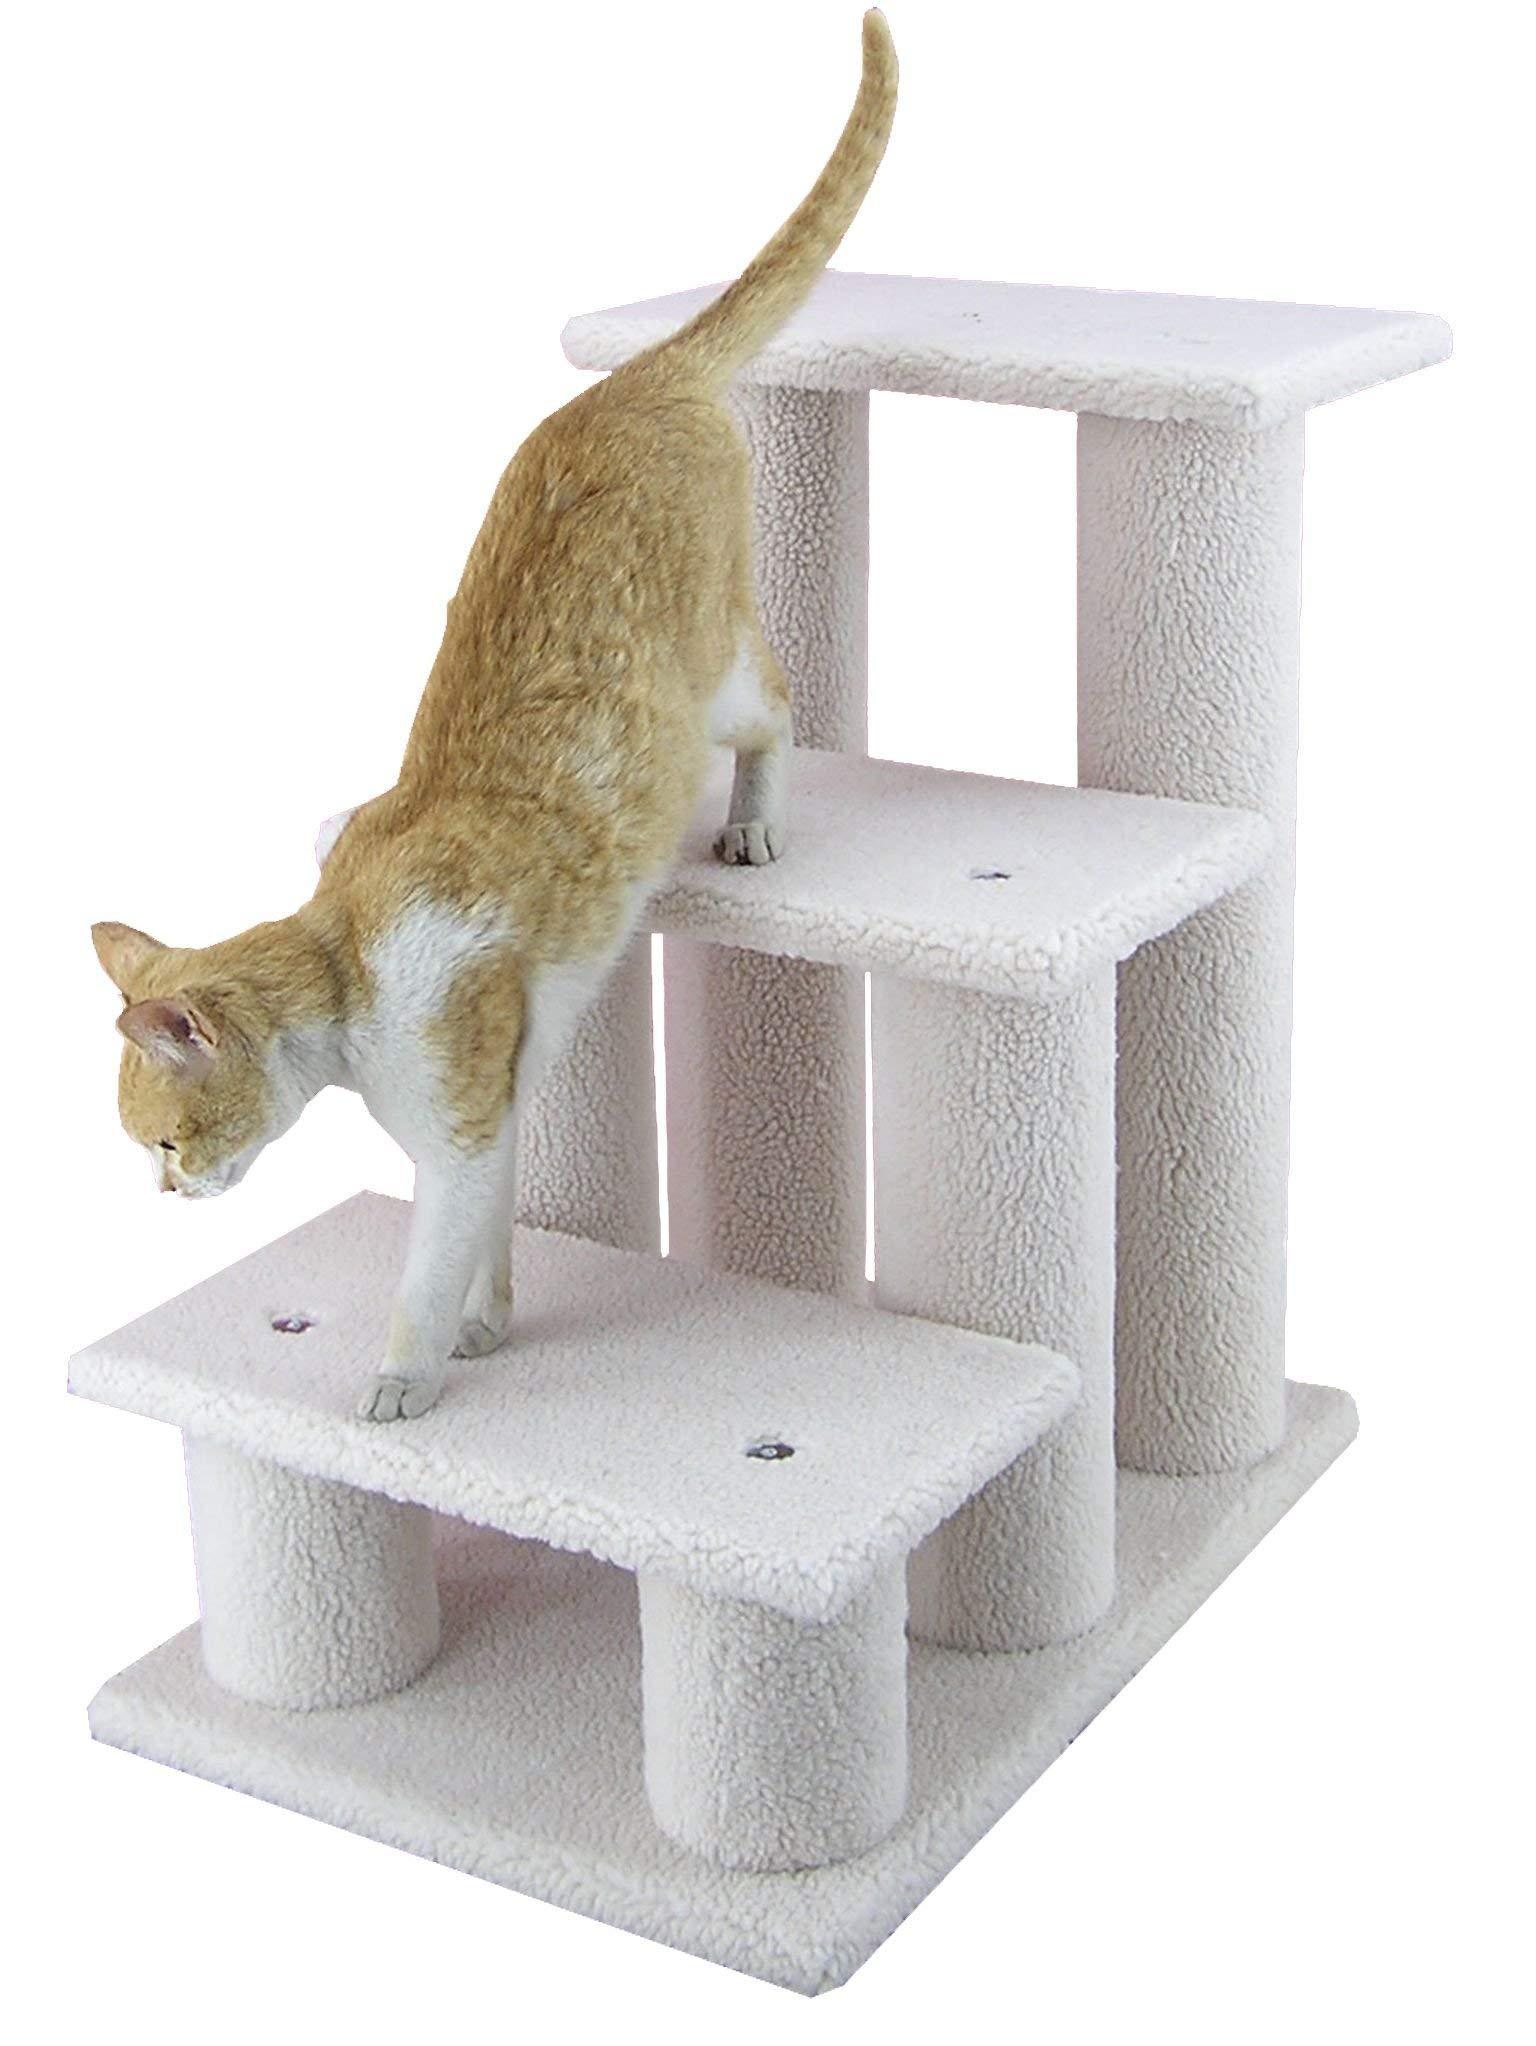 Armarkat Pet Steps, 3-steps, B3001, Ivory by Armarkat